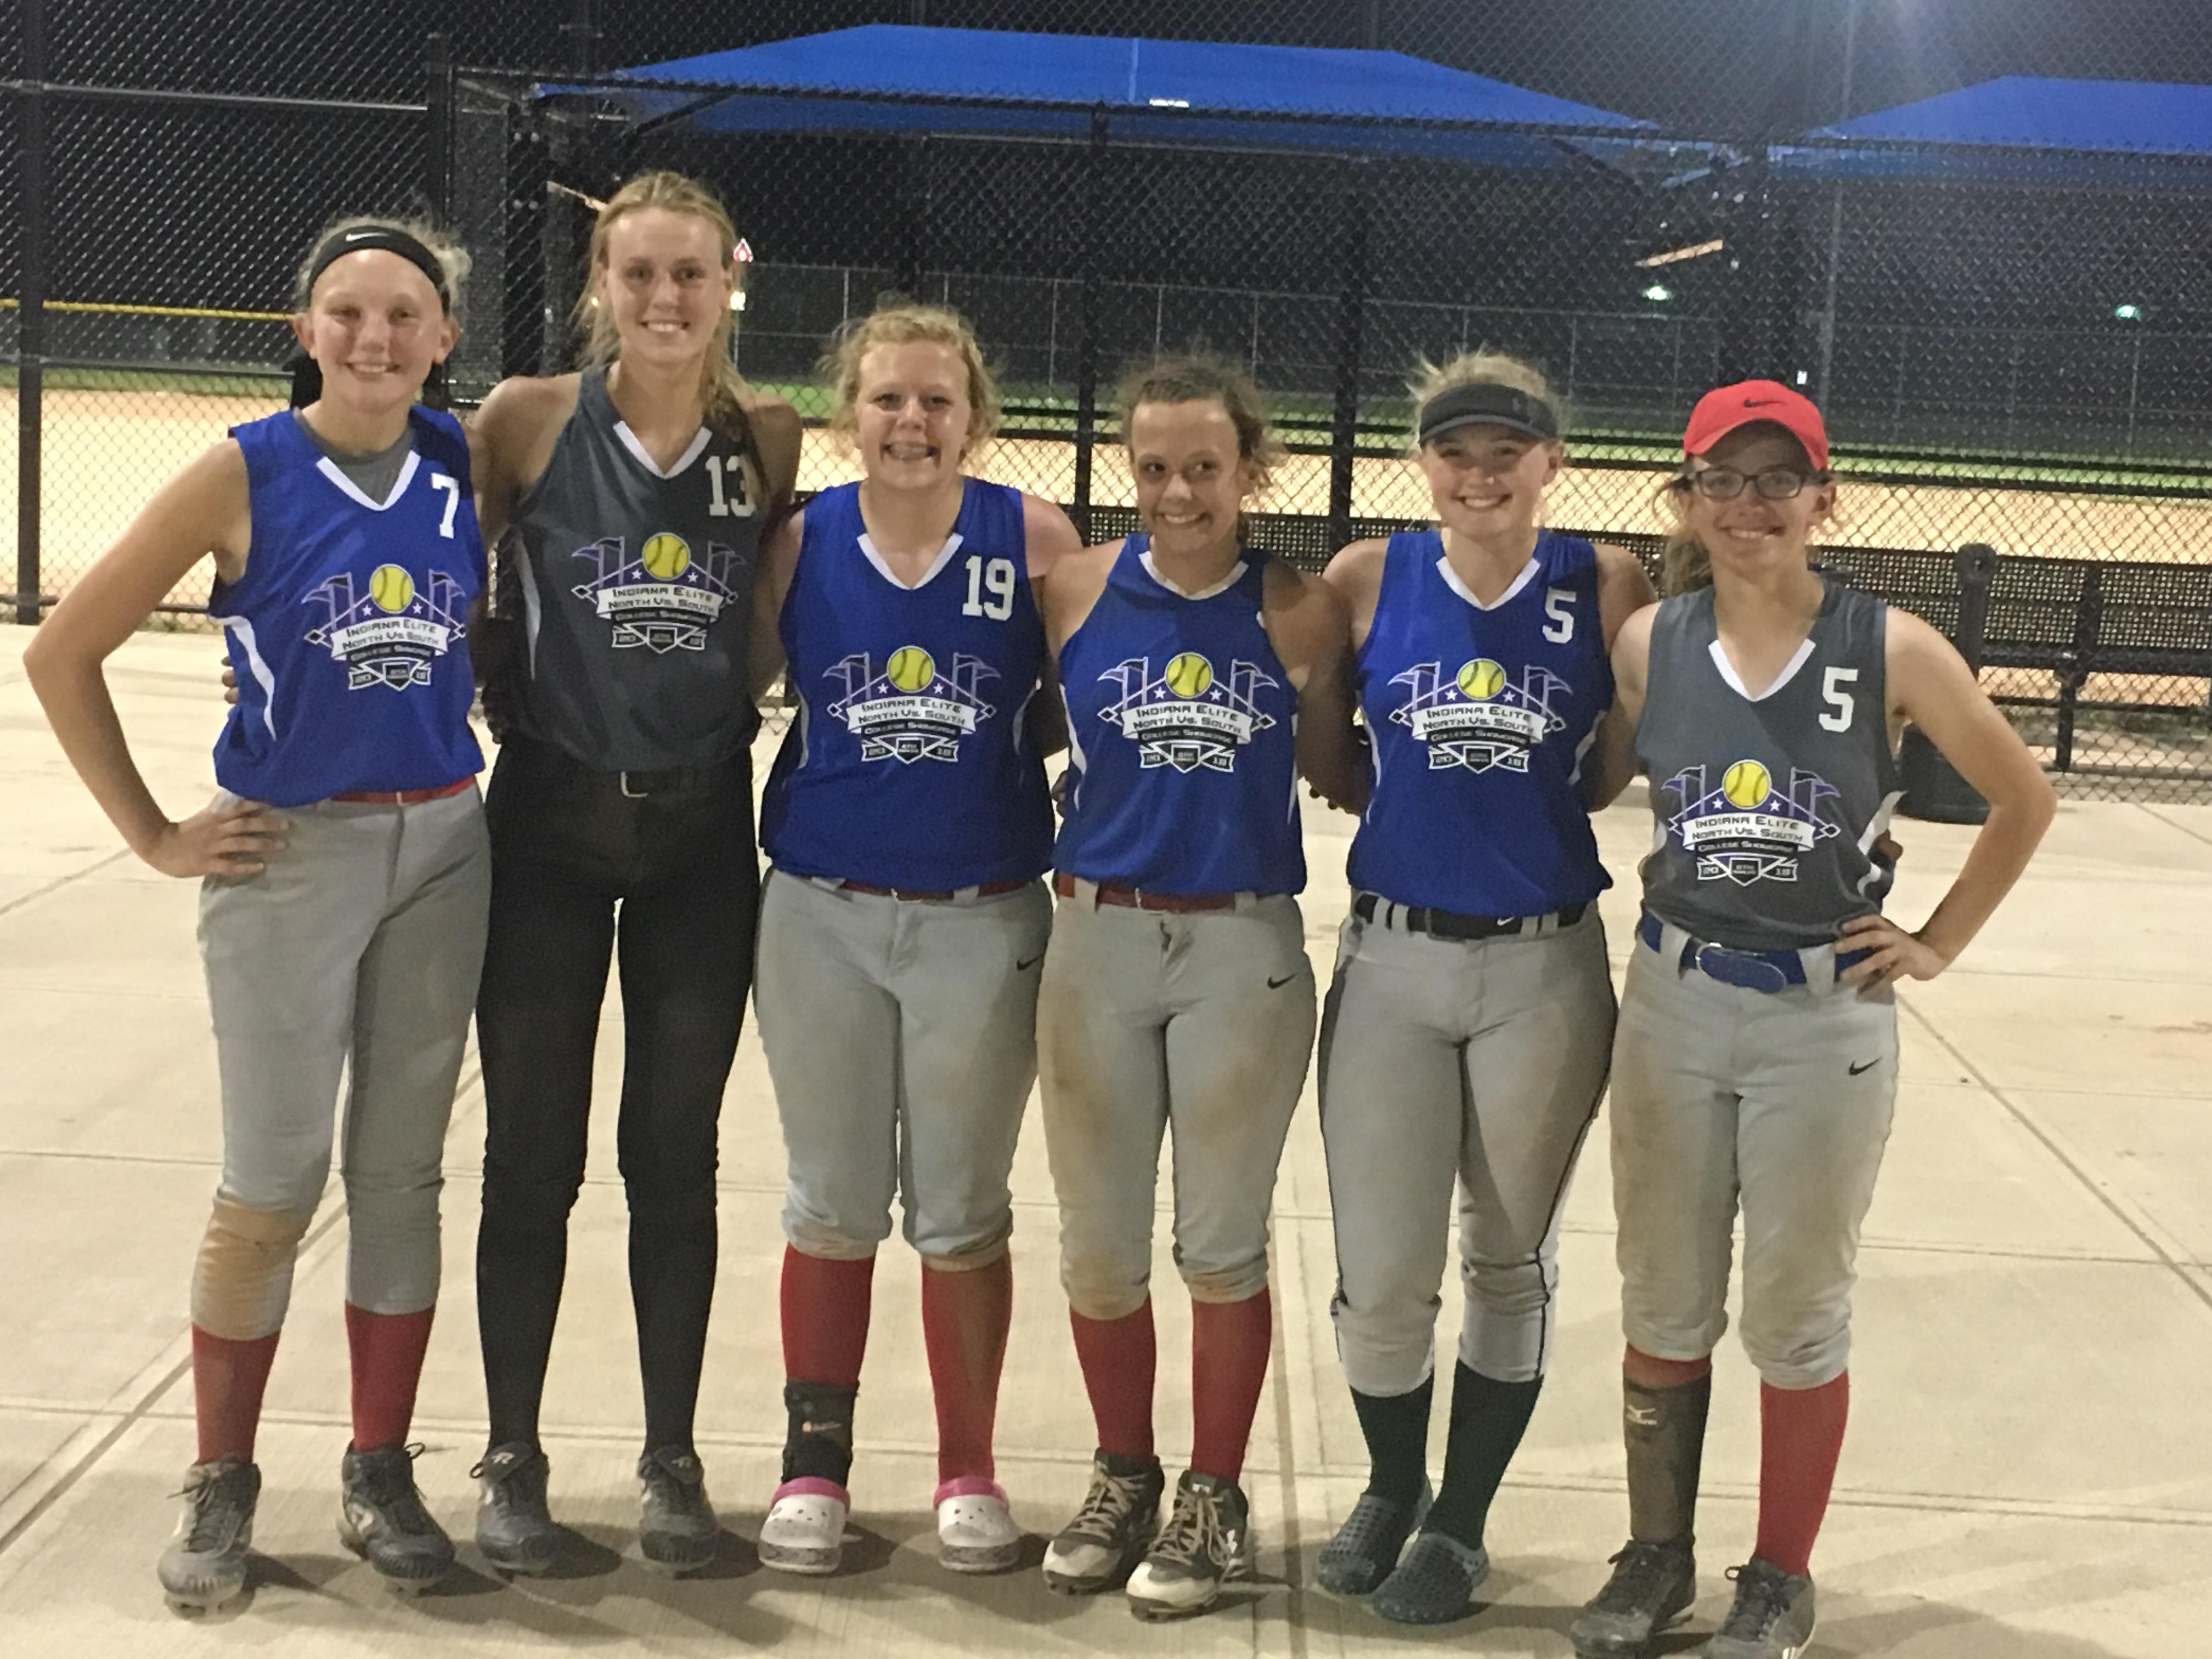 Softball Players Showcase Their Skills